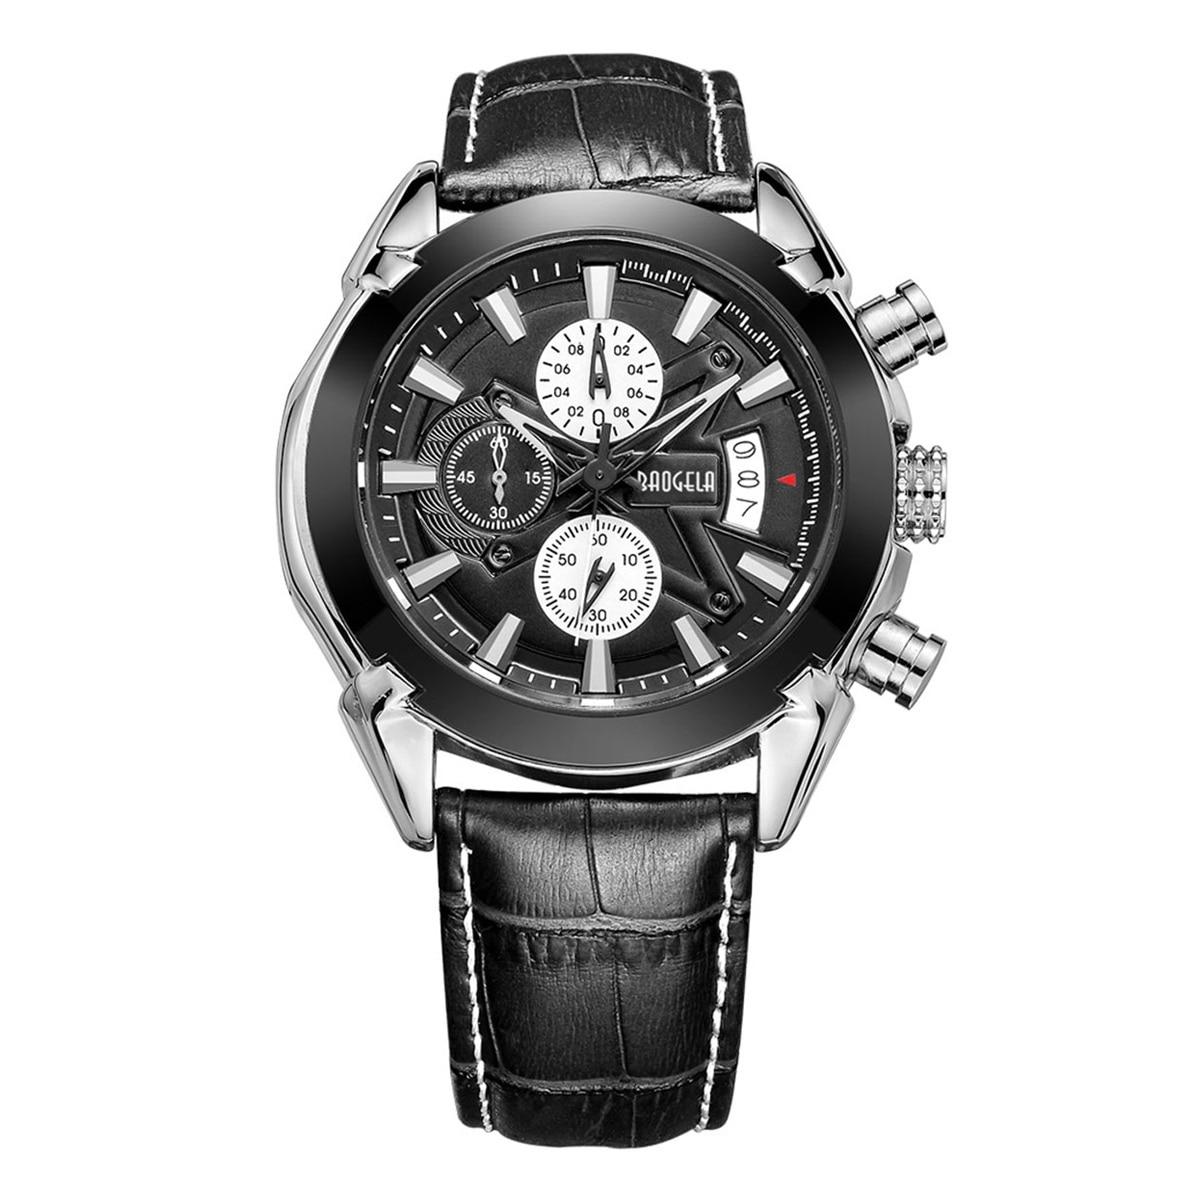 BAOGELA Mens Chronograph Luminous Hands Date Indicator Fashion Causal Leather Strap Sport Quartz Wrist Watches 1602 Black все цены